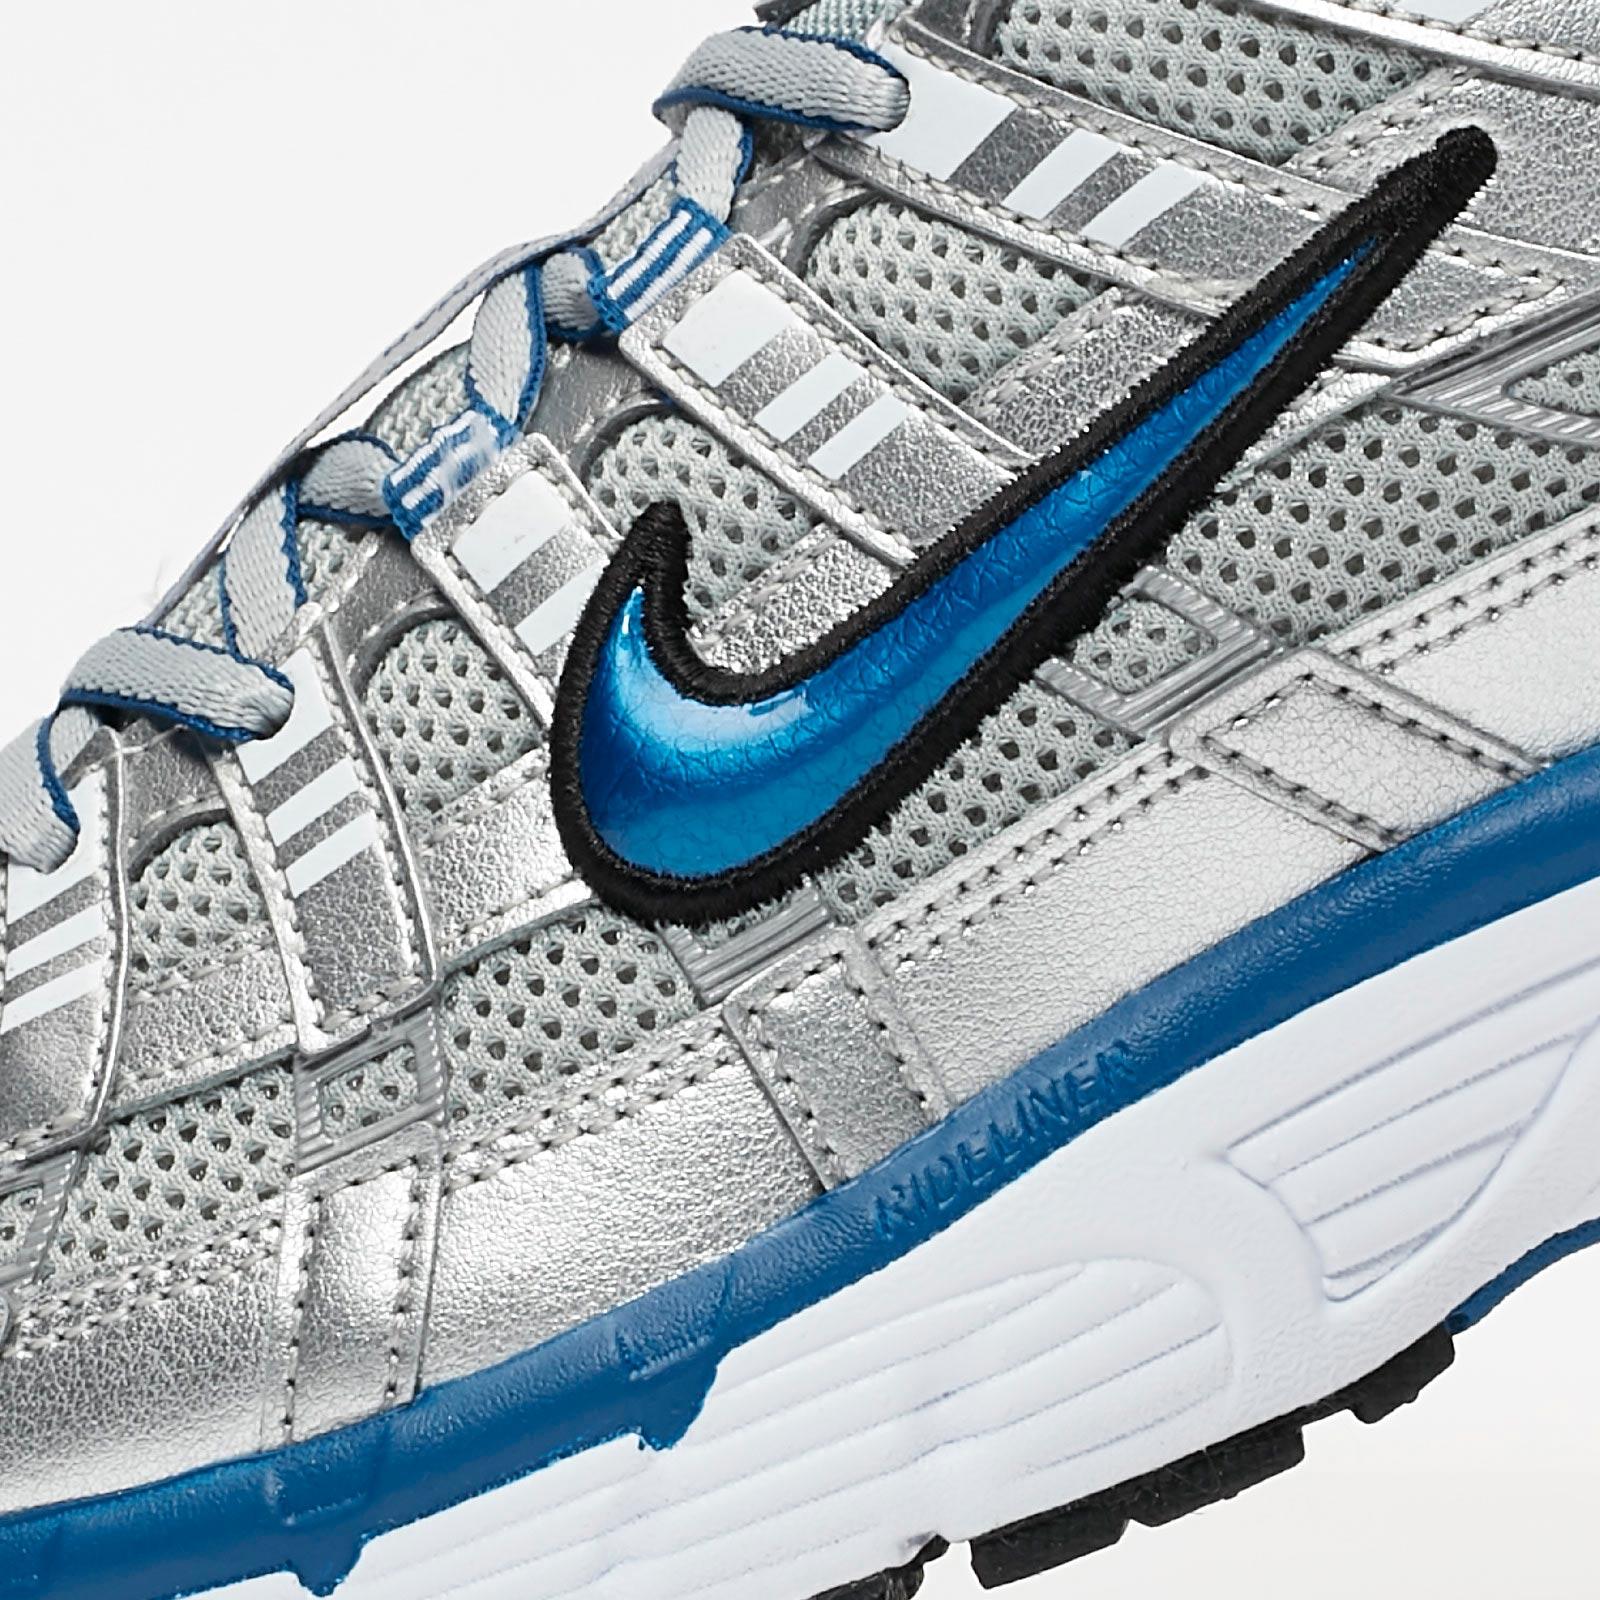 low priced 26eec 145cb Nike Wmns P-6000 - Bv1021-001 - Sneakersnstuff   sneakers   streetwear  online since 1999